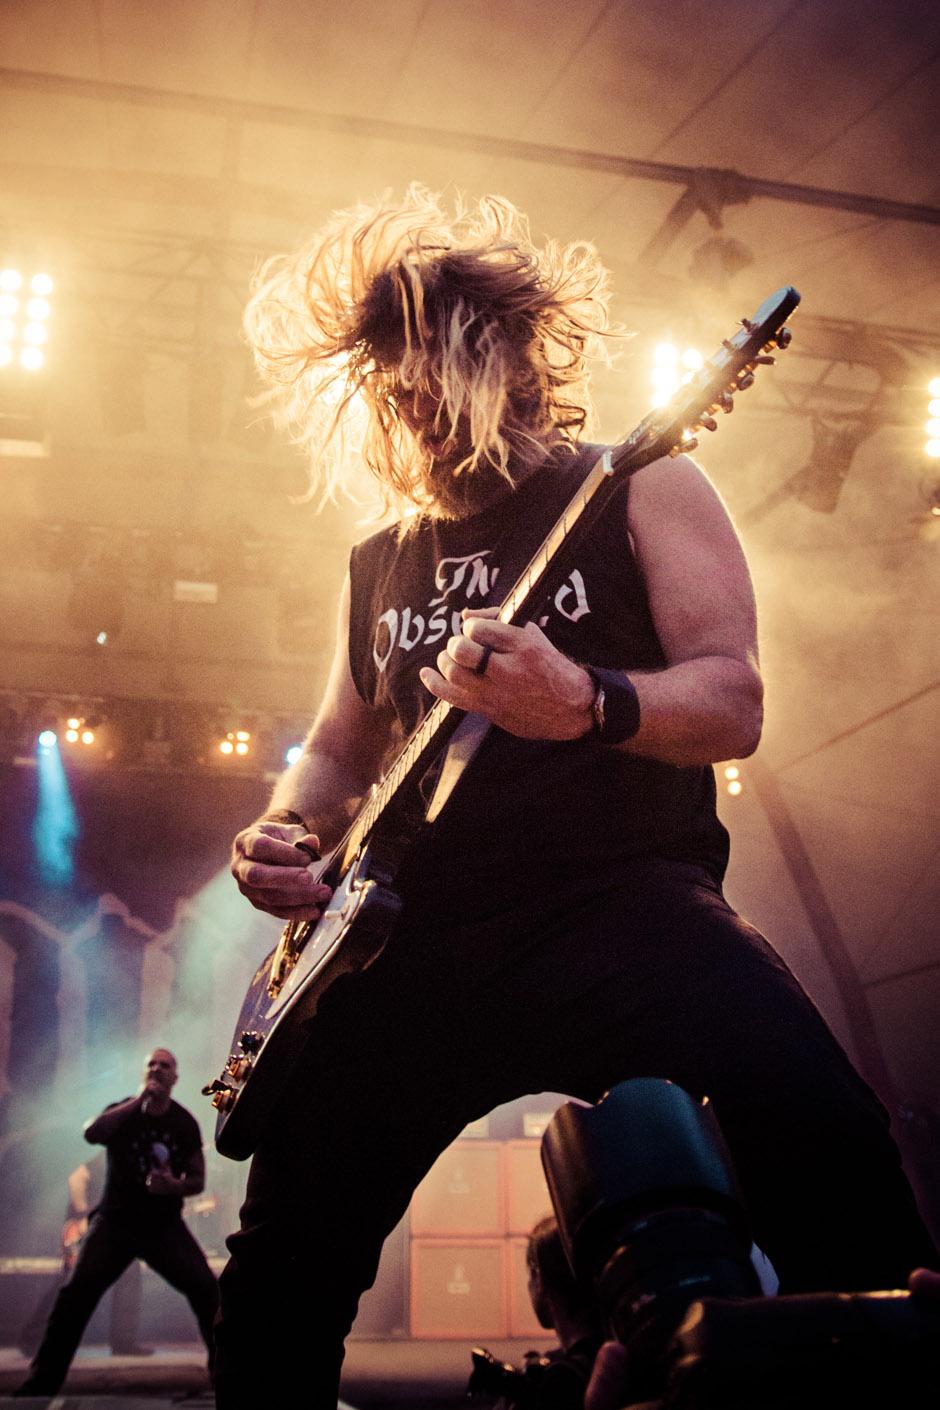 Down live, Metalfest Loreley 2013